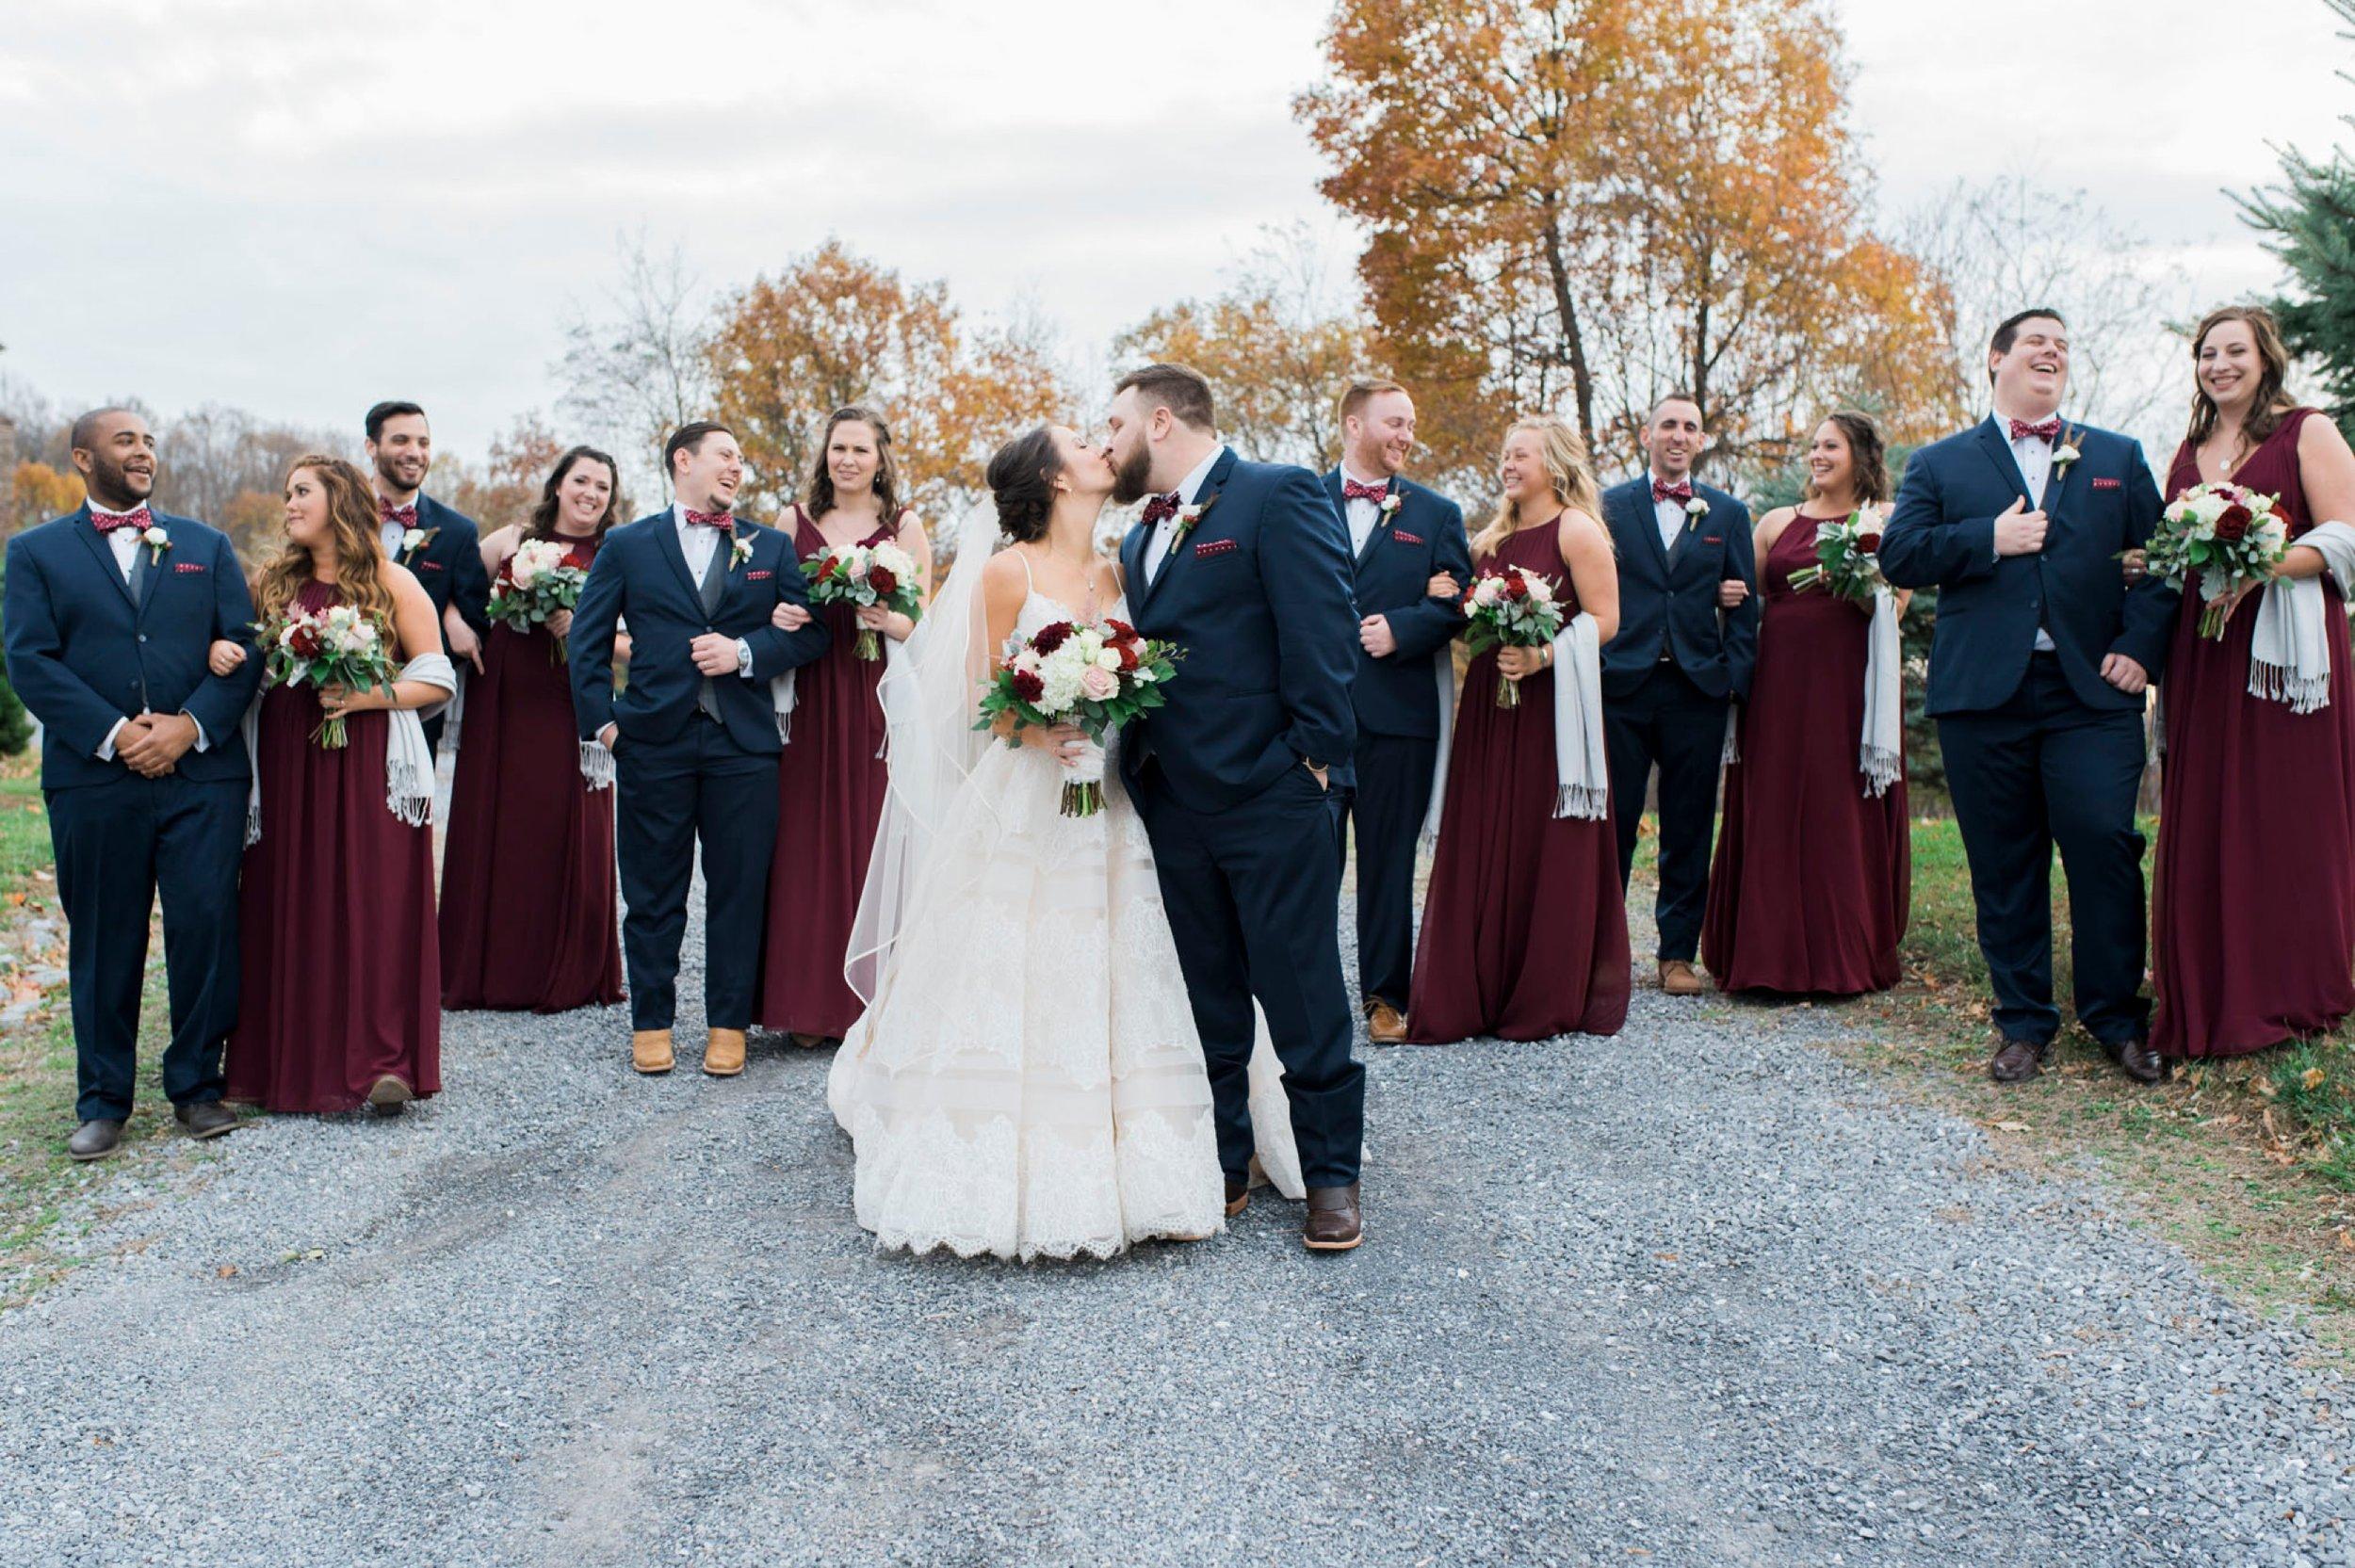 IrvineEstate_LexingtonVA_Wedding_FallWedding_VirginiaWeddingPhotographer 74.jpg